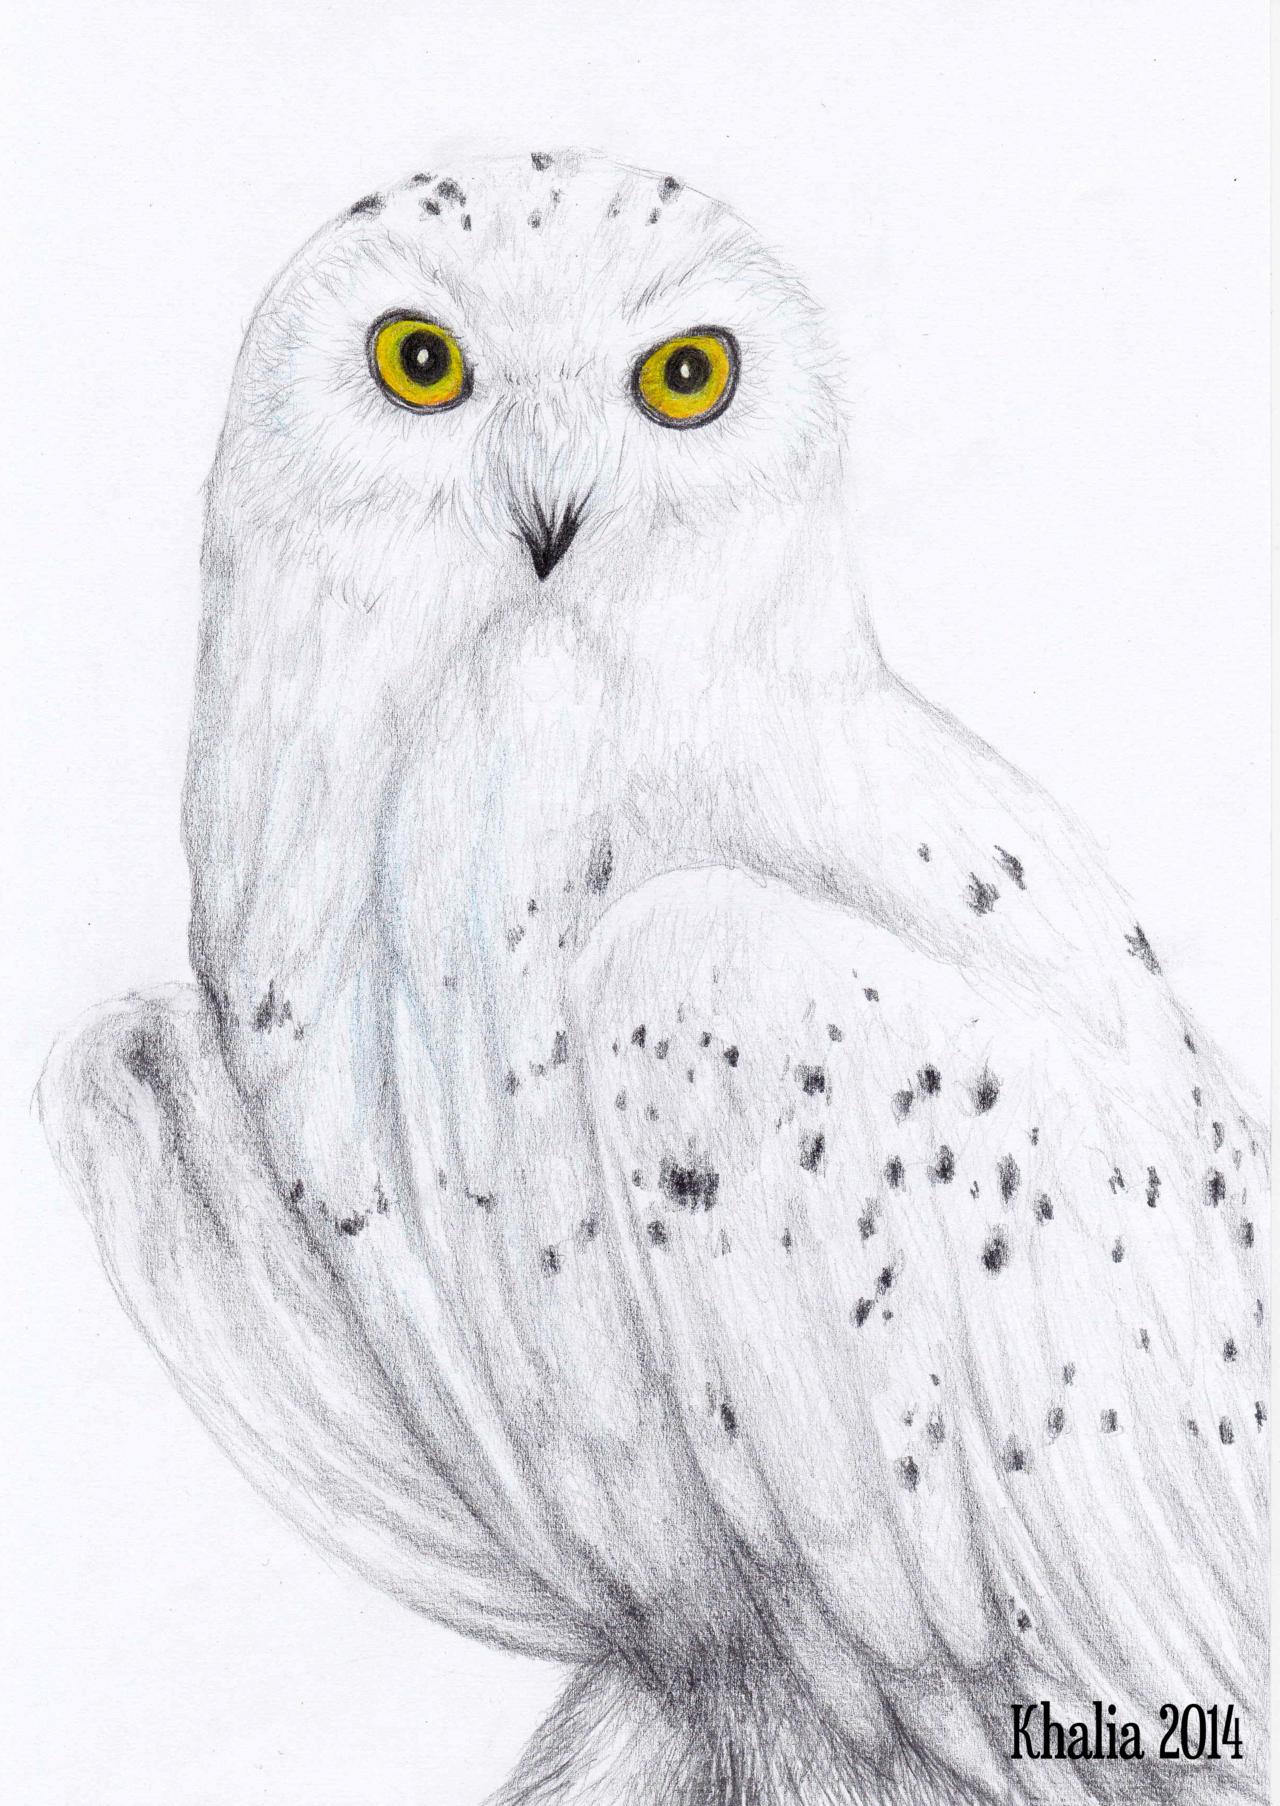 Drawn owl snowy owl #5